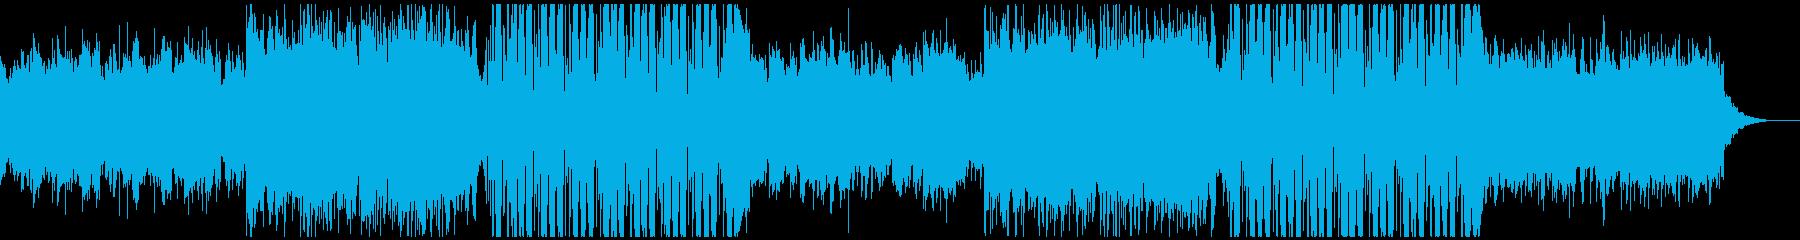 FuturePop3、お洒落、洋楽、夏Lの再生済みの波形